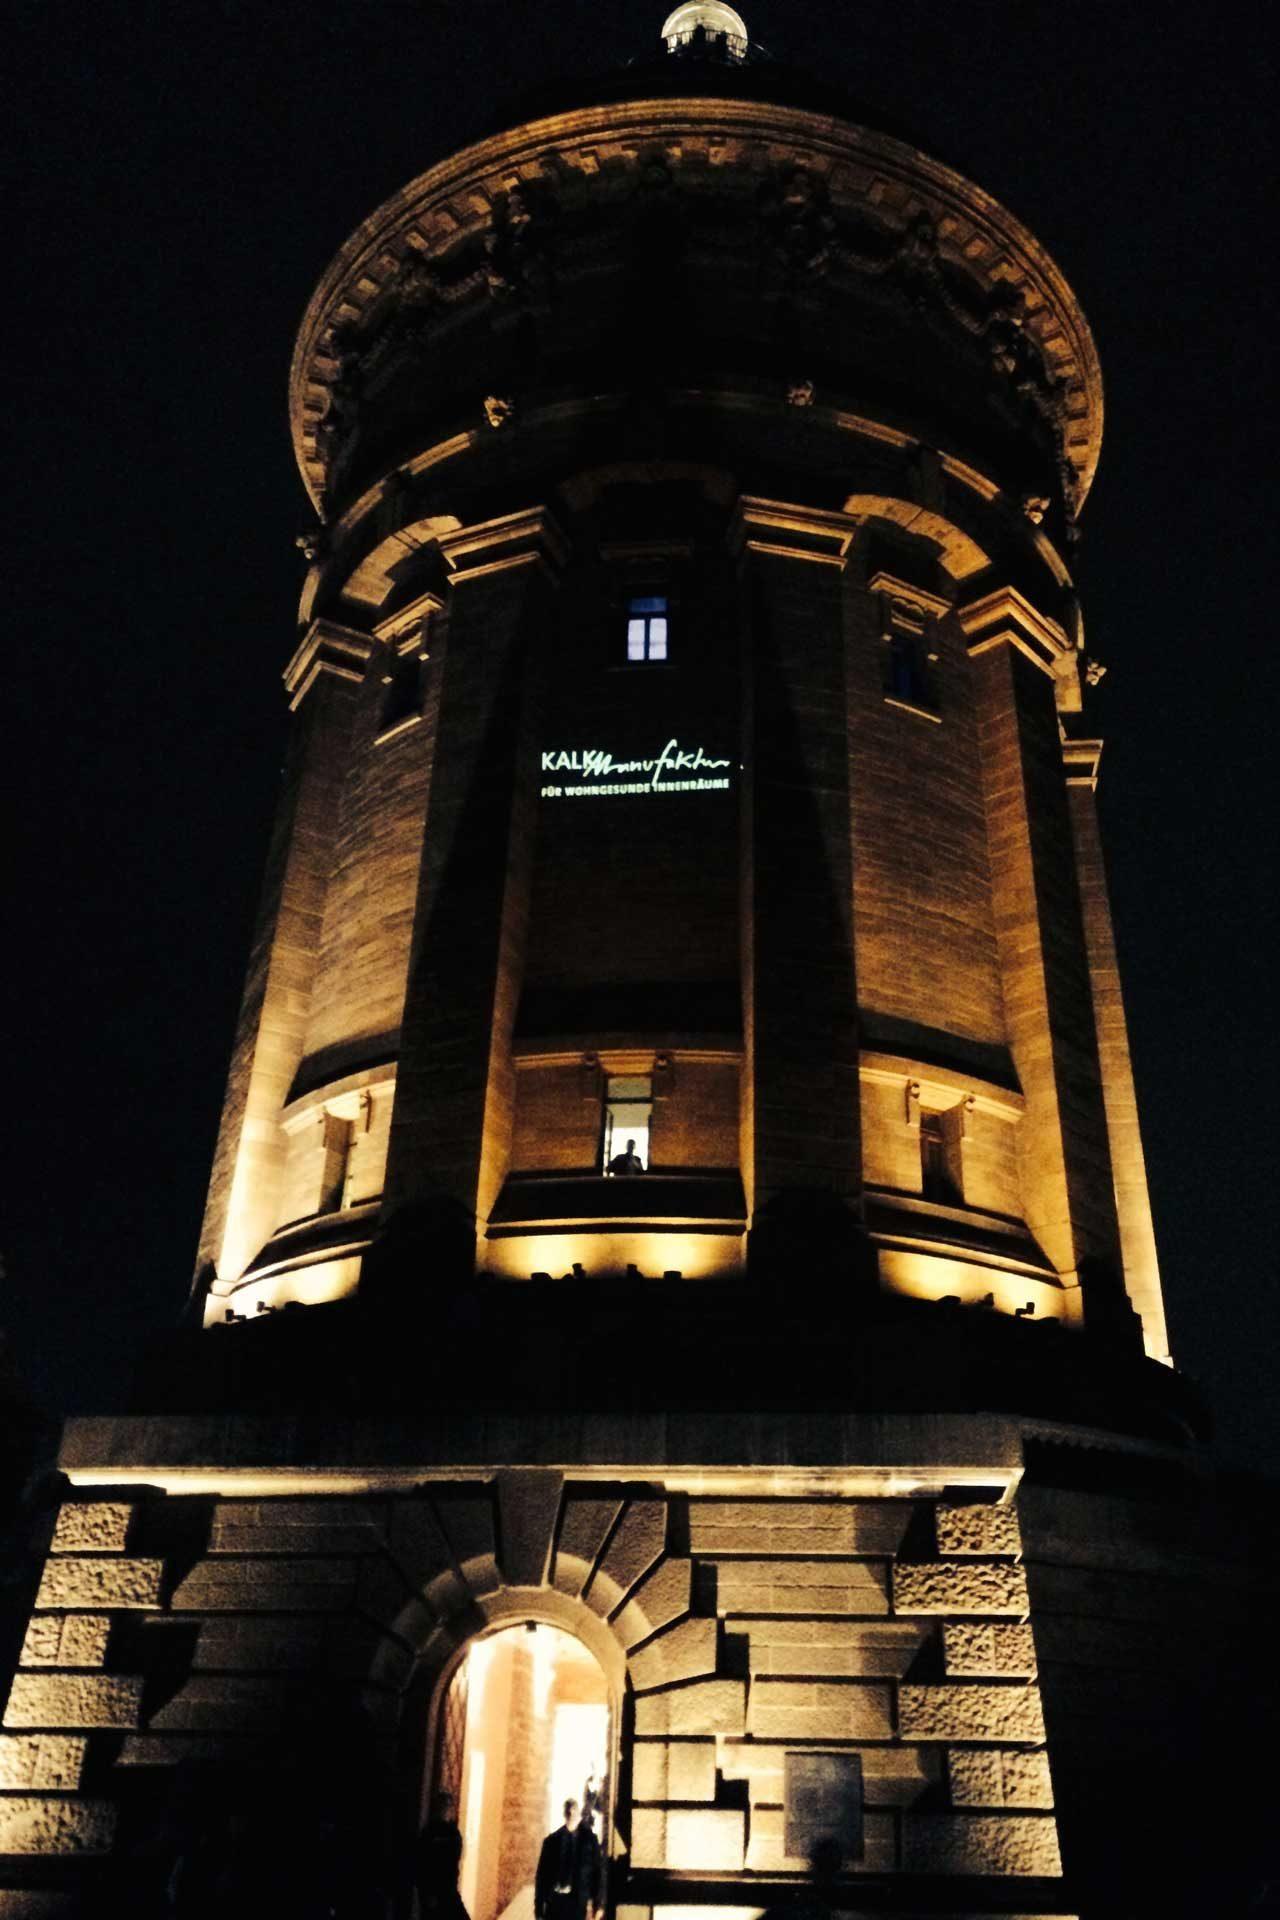 KalkManufaktur - Wasserturm Mannheim